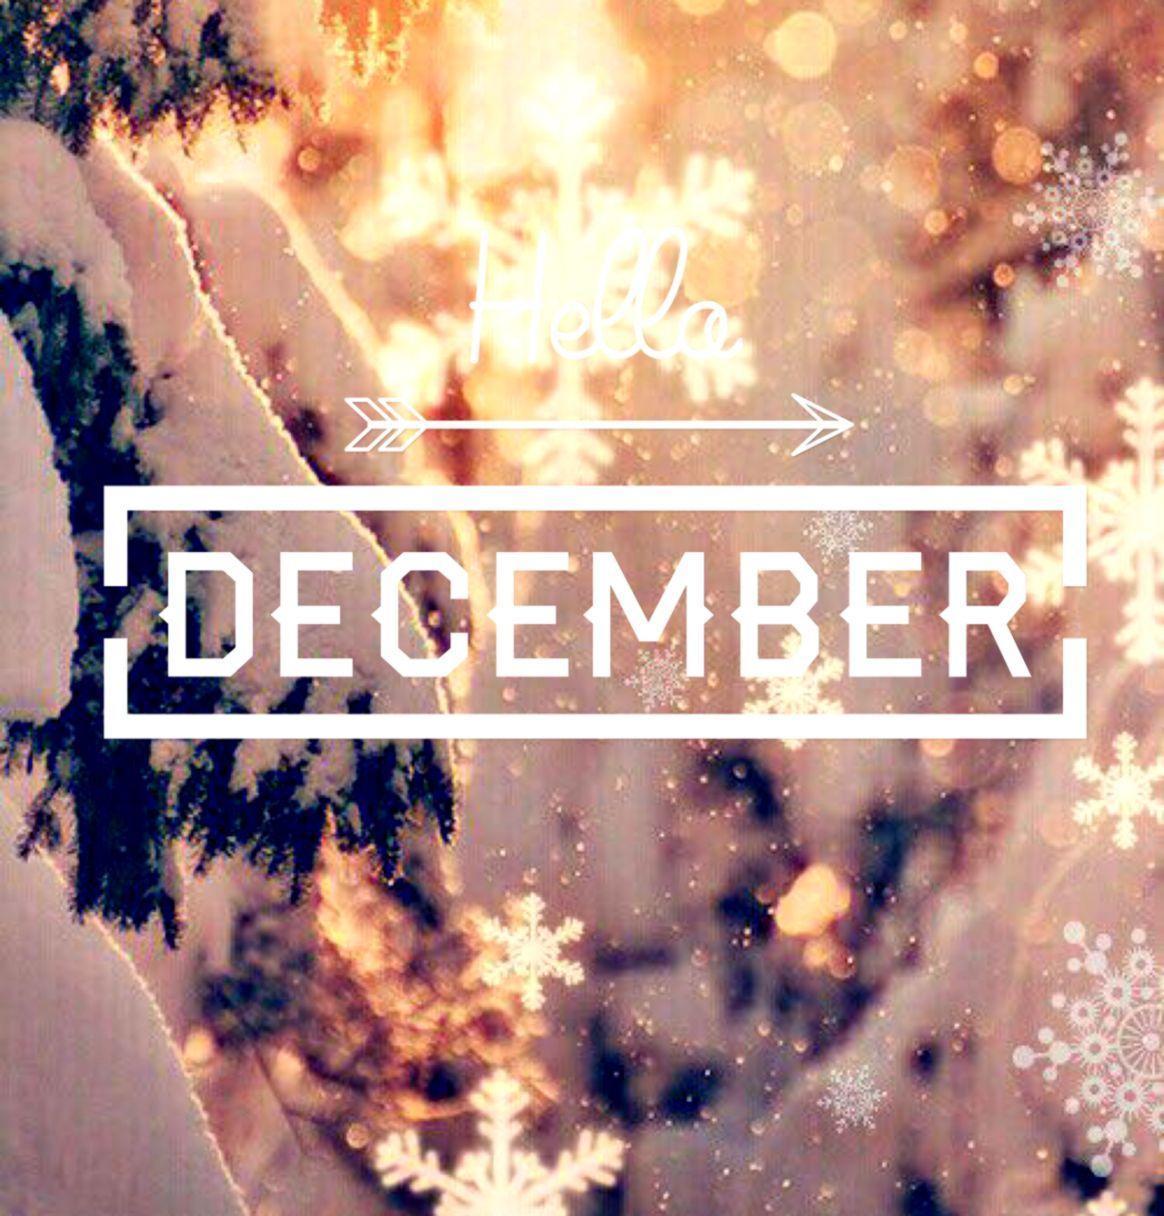 hello december wallpapers top free